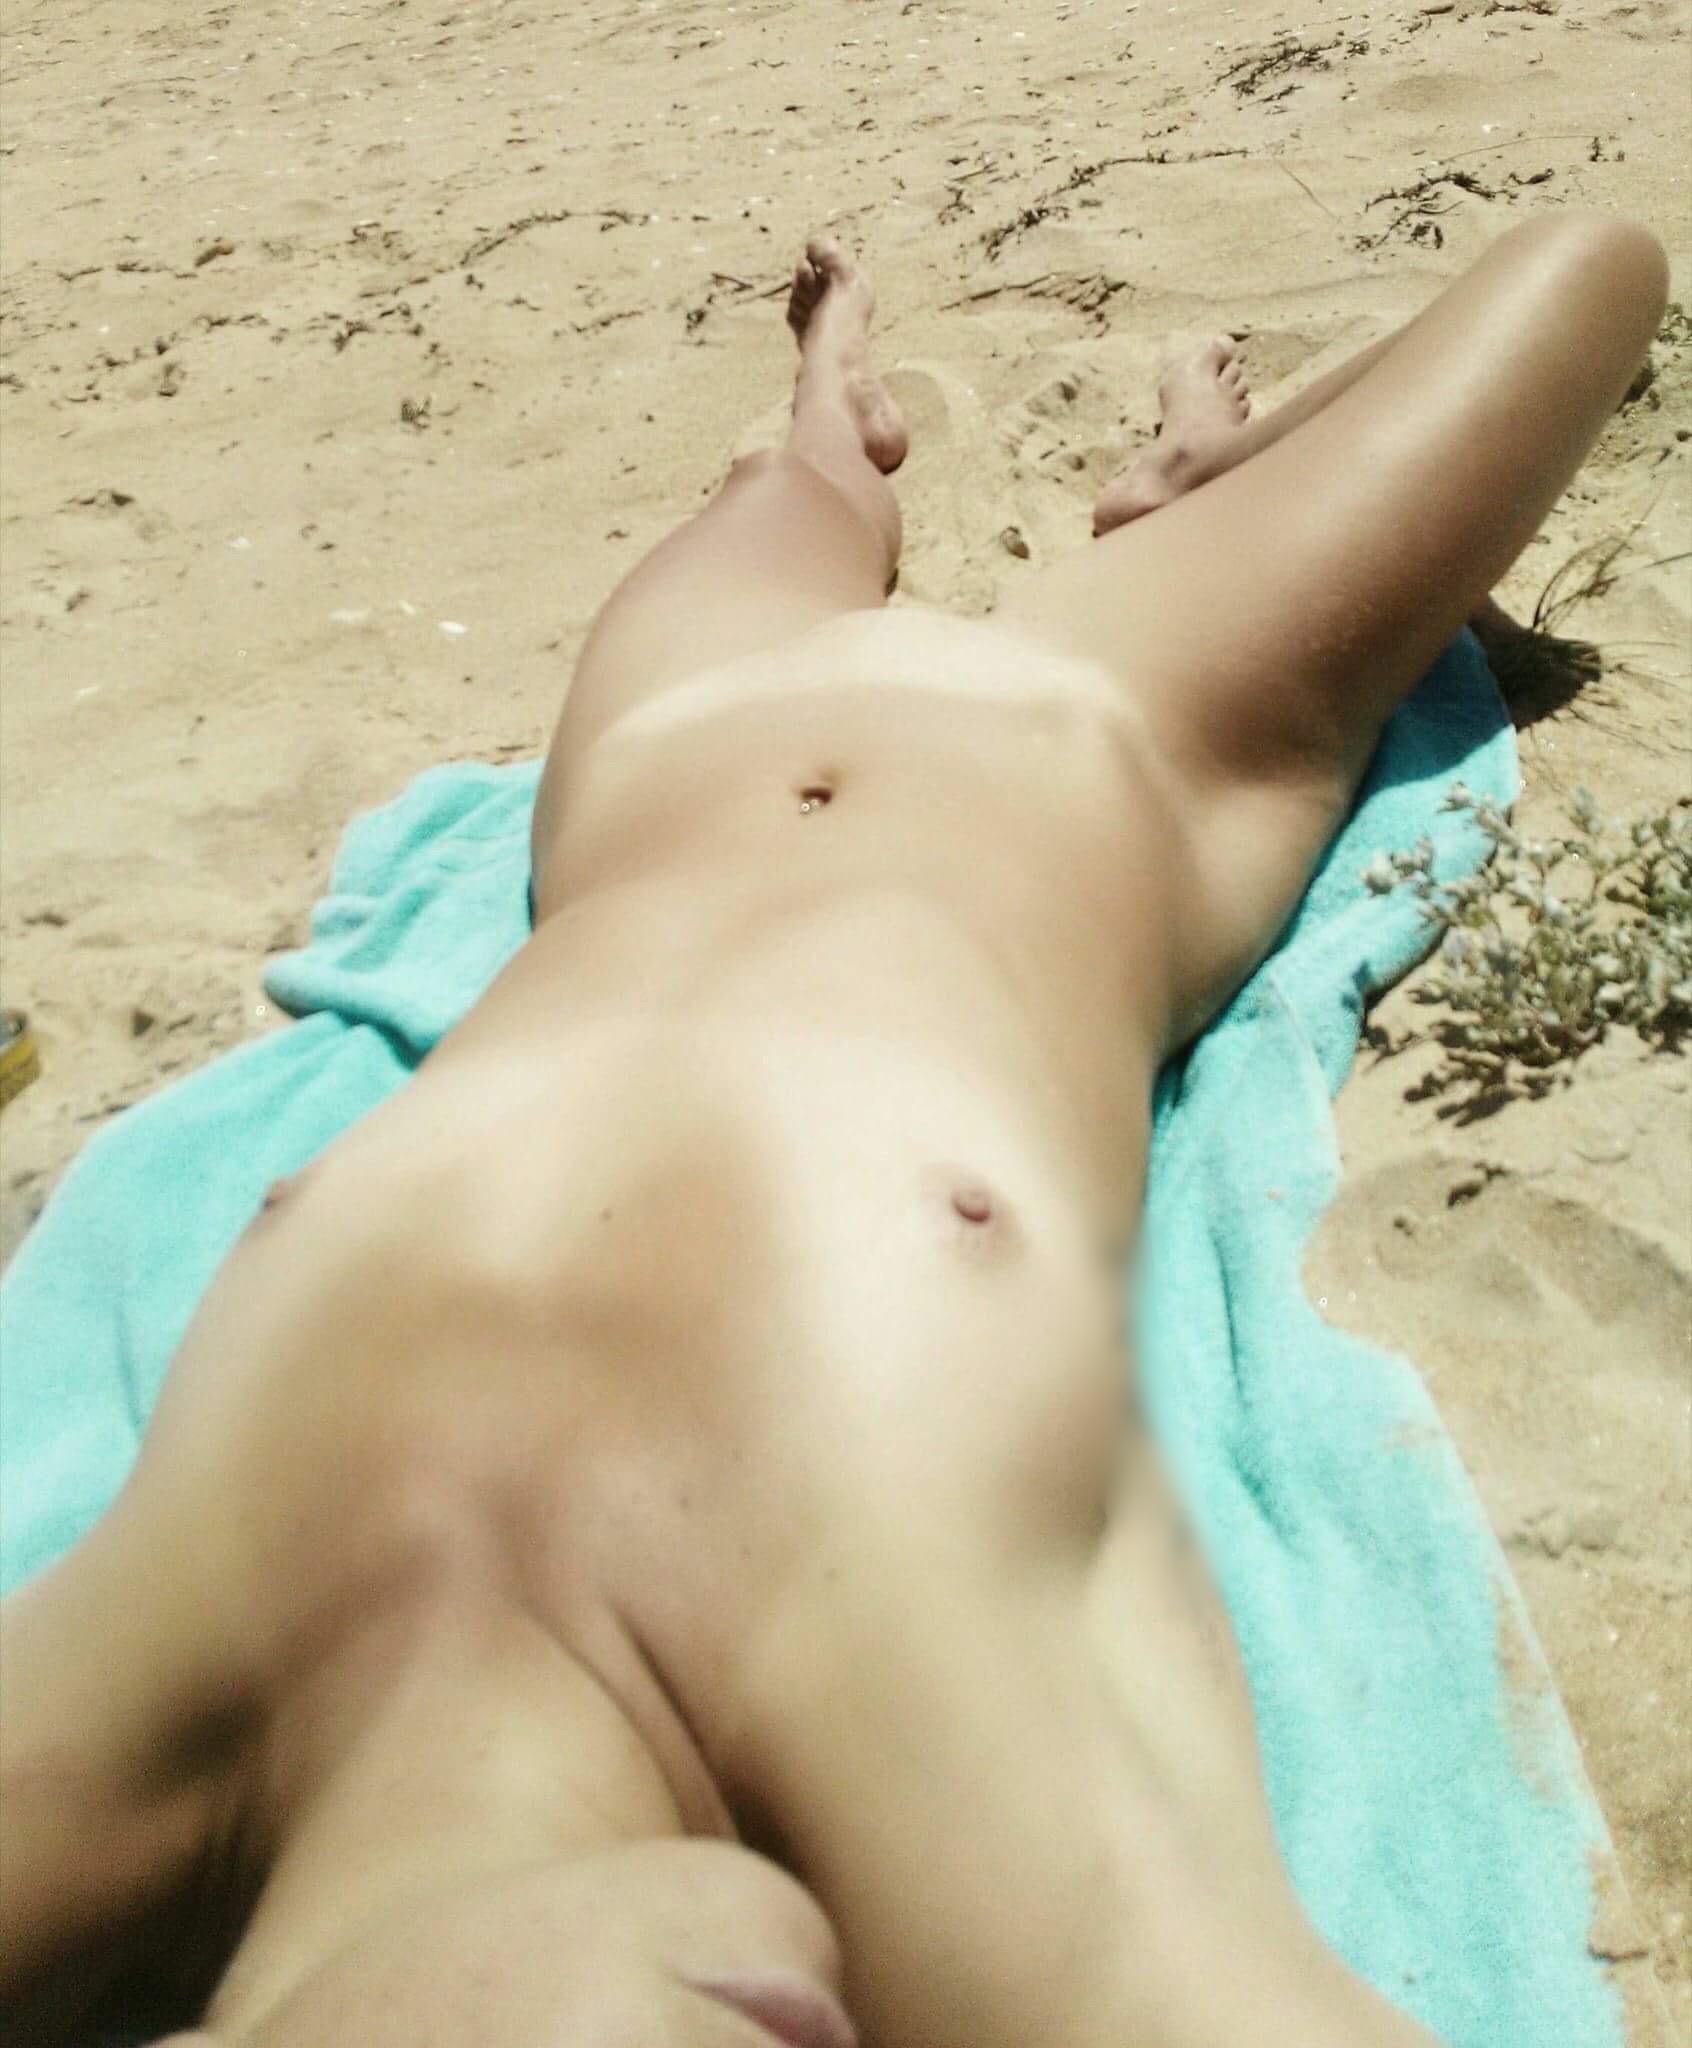 sabine la salope belle salope a la plage